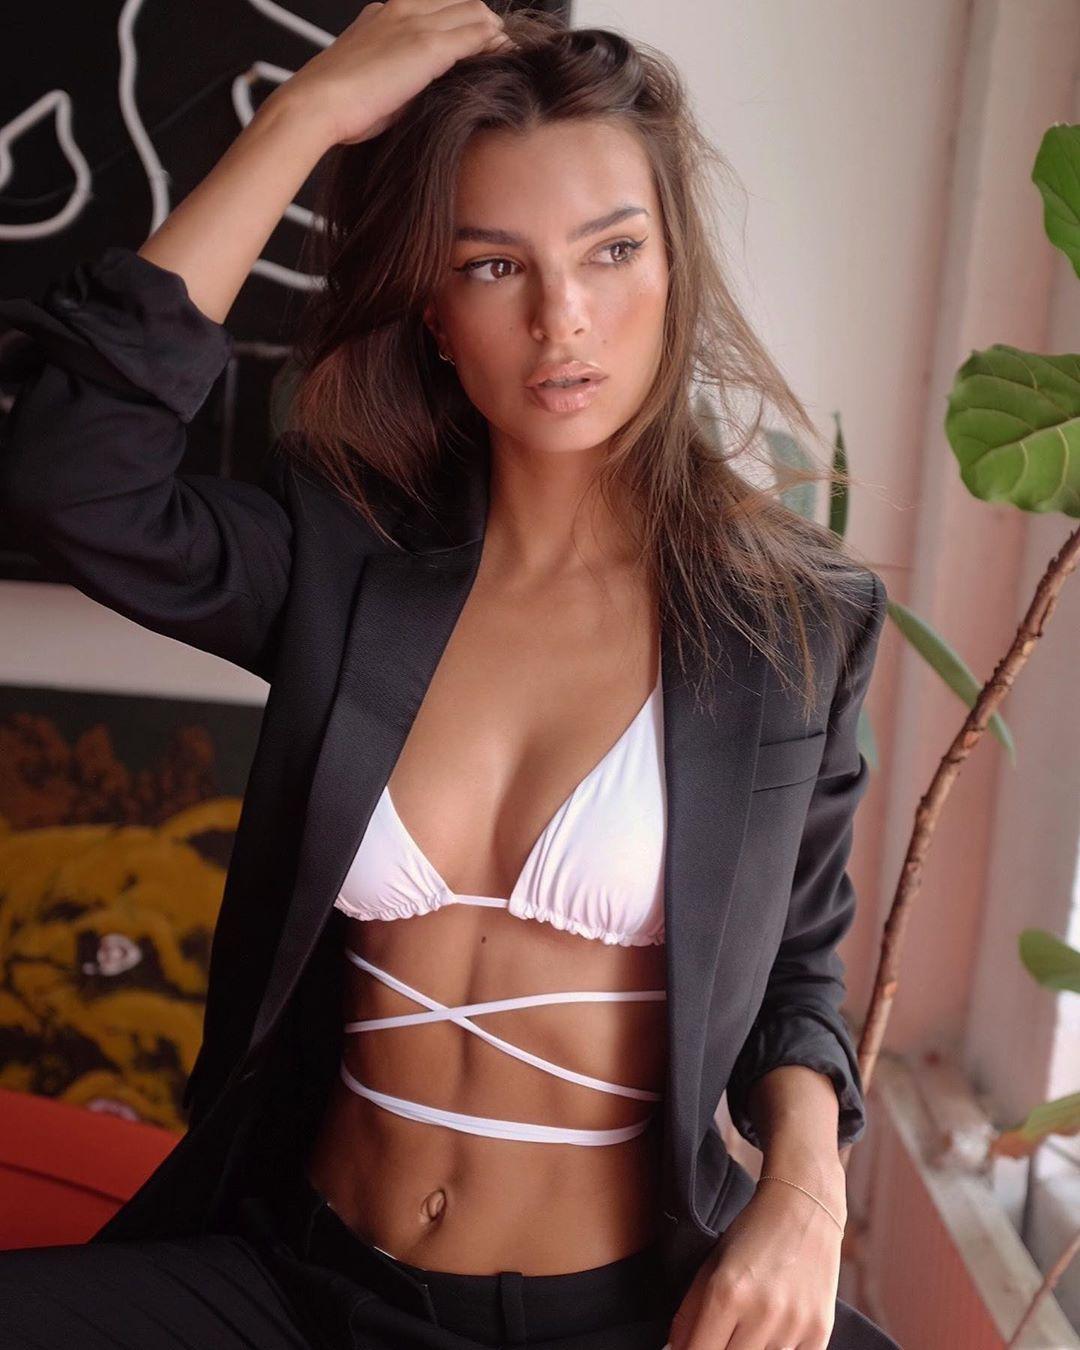 emily ratajkowski Mặc bộ suit đen với kiểu bikini đẹp buộc dây